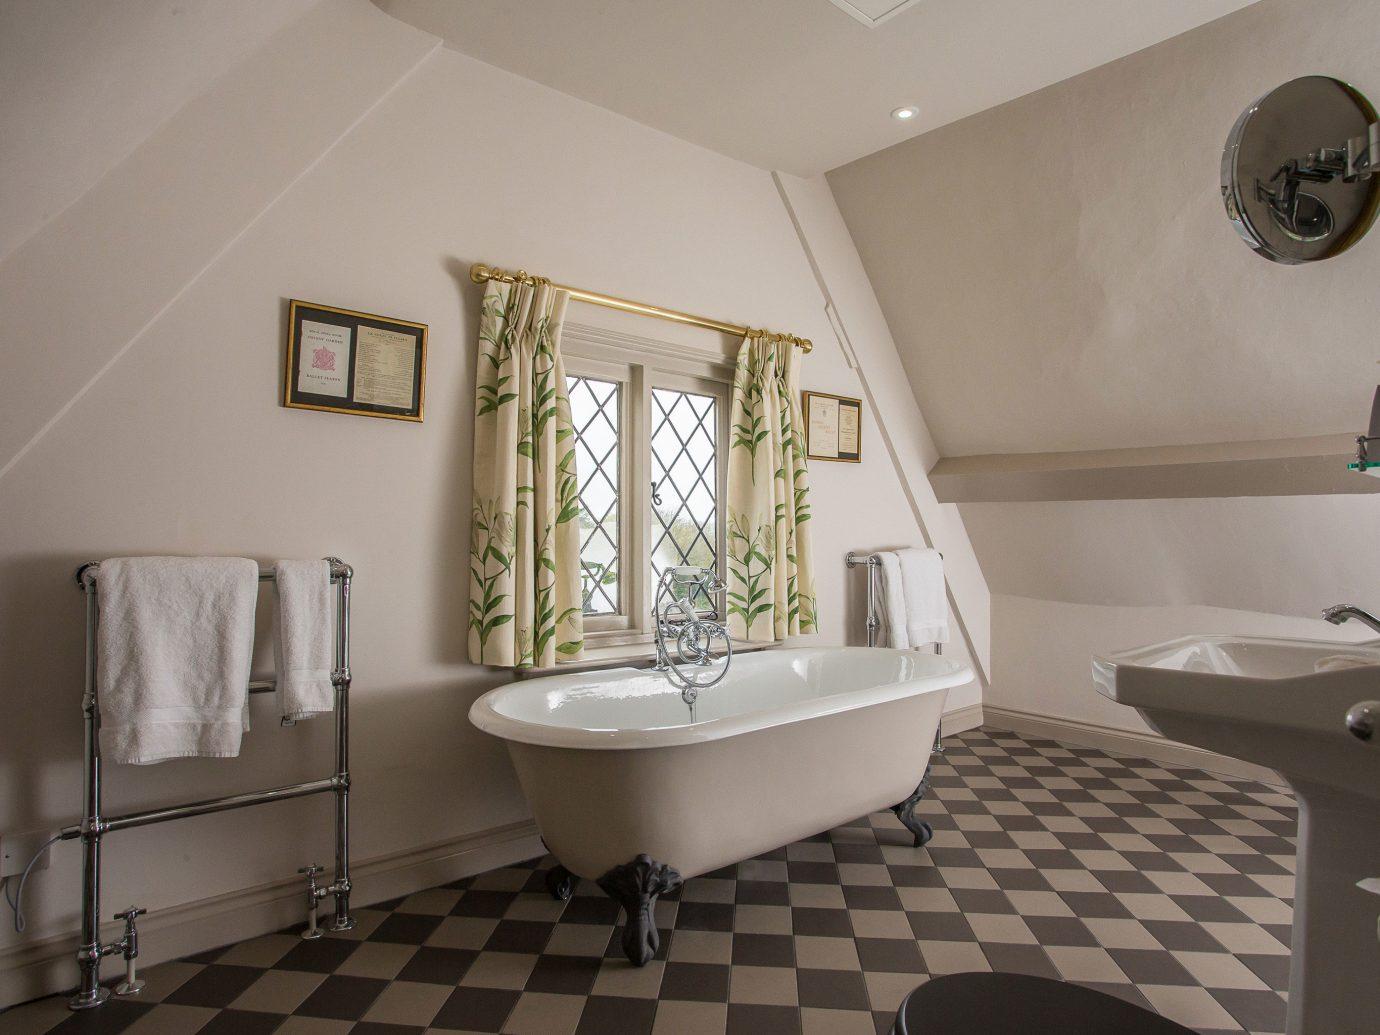 Hotels wall indoor bathroom floor room property home estate interior design sink cottage Design bathtub real estate apartment plumbing fixture tub tiled Bath tile furniture